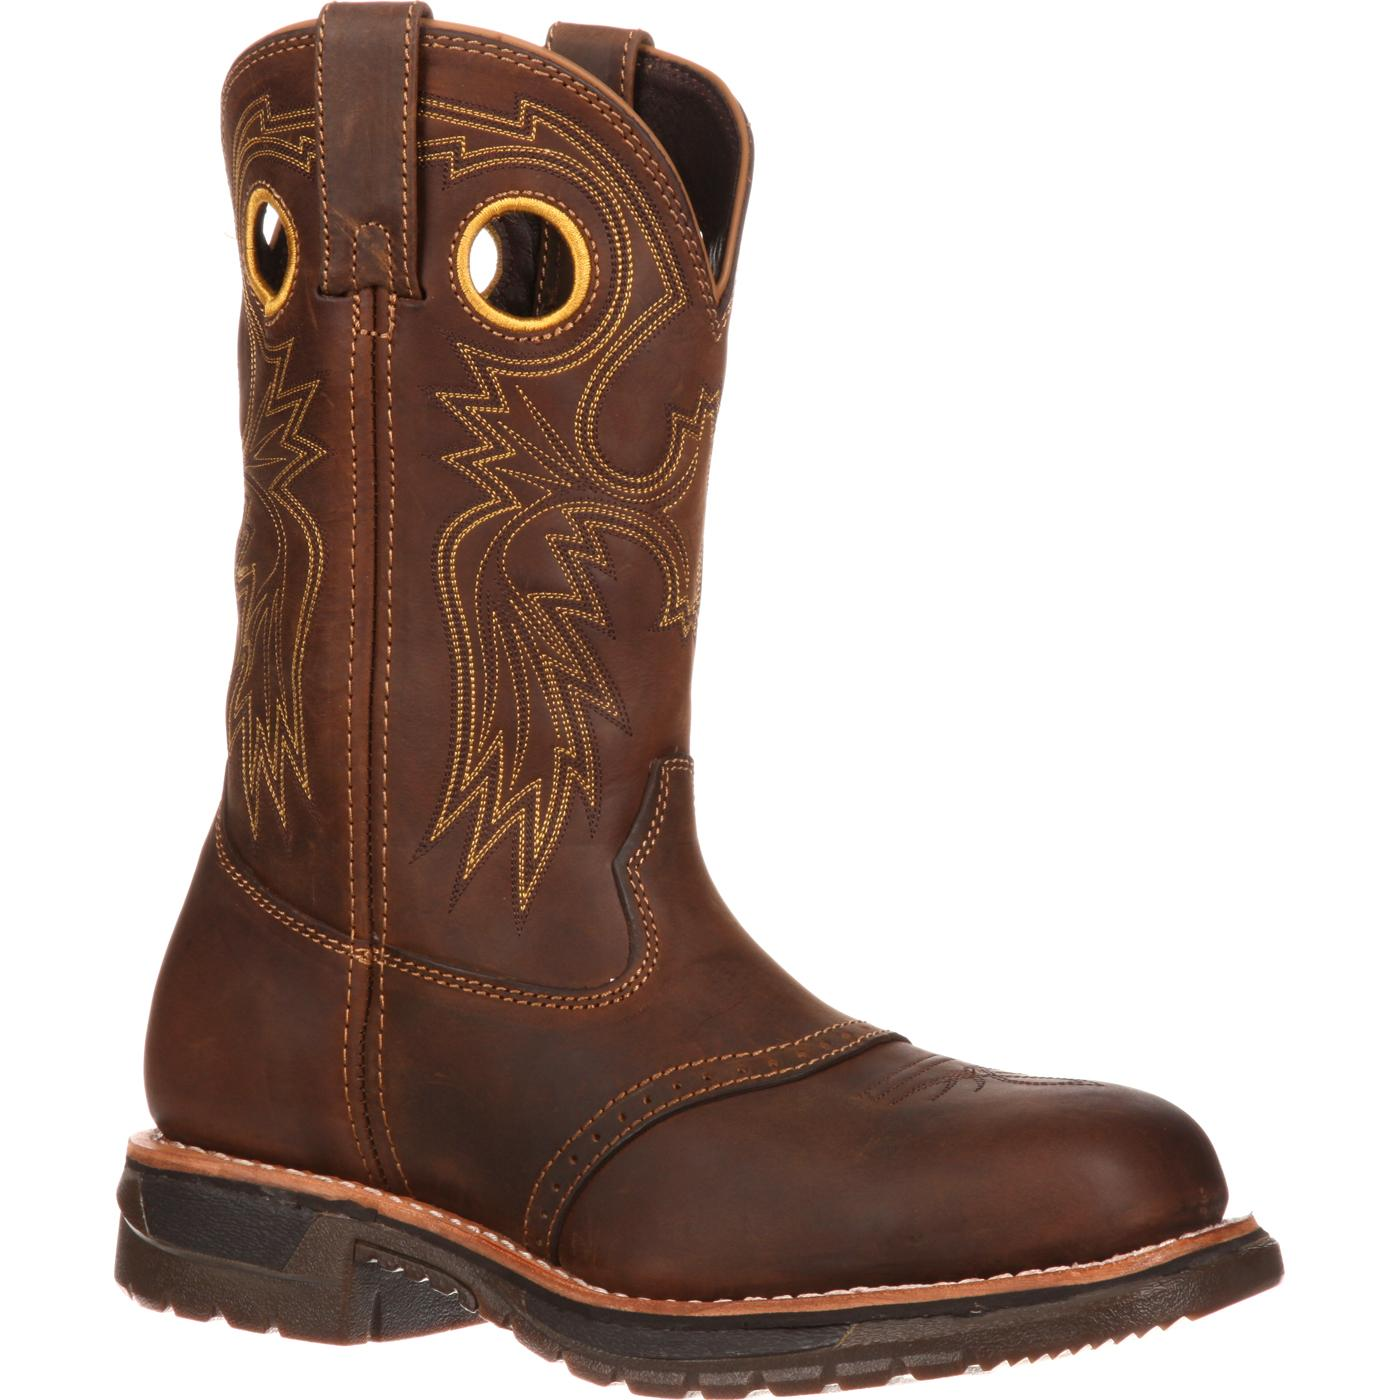 Rocky Original Ride Men's ... Steel-Toe Western Work Boots tpJGq0